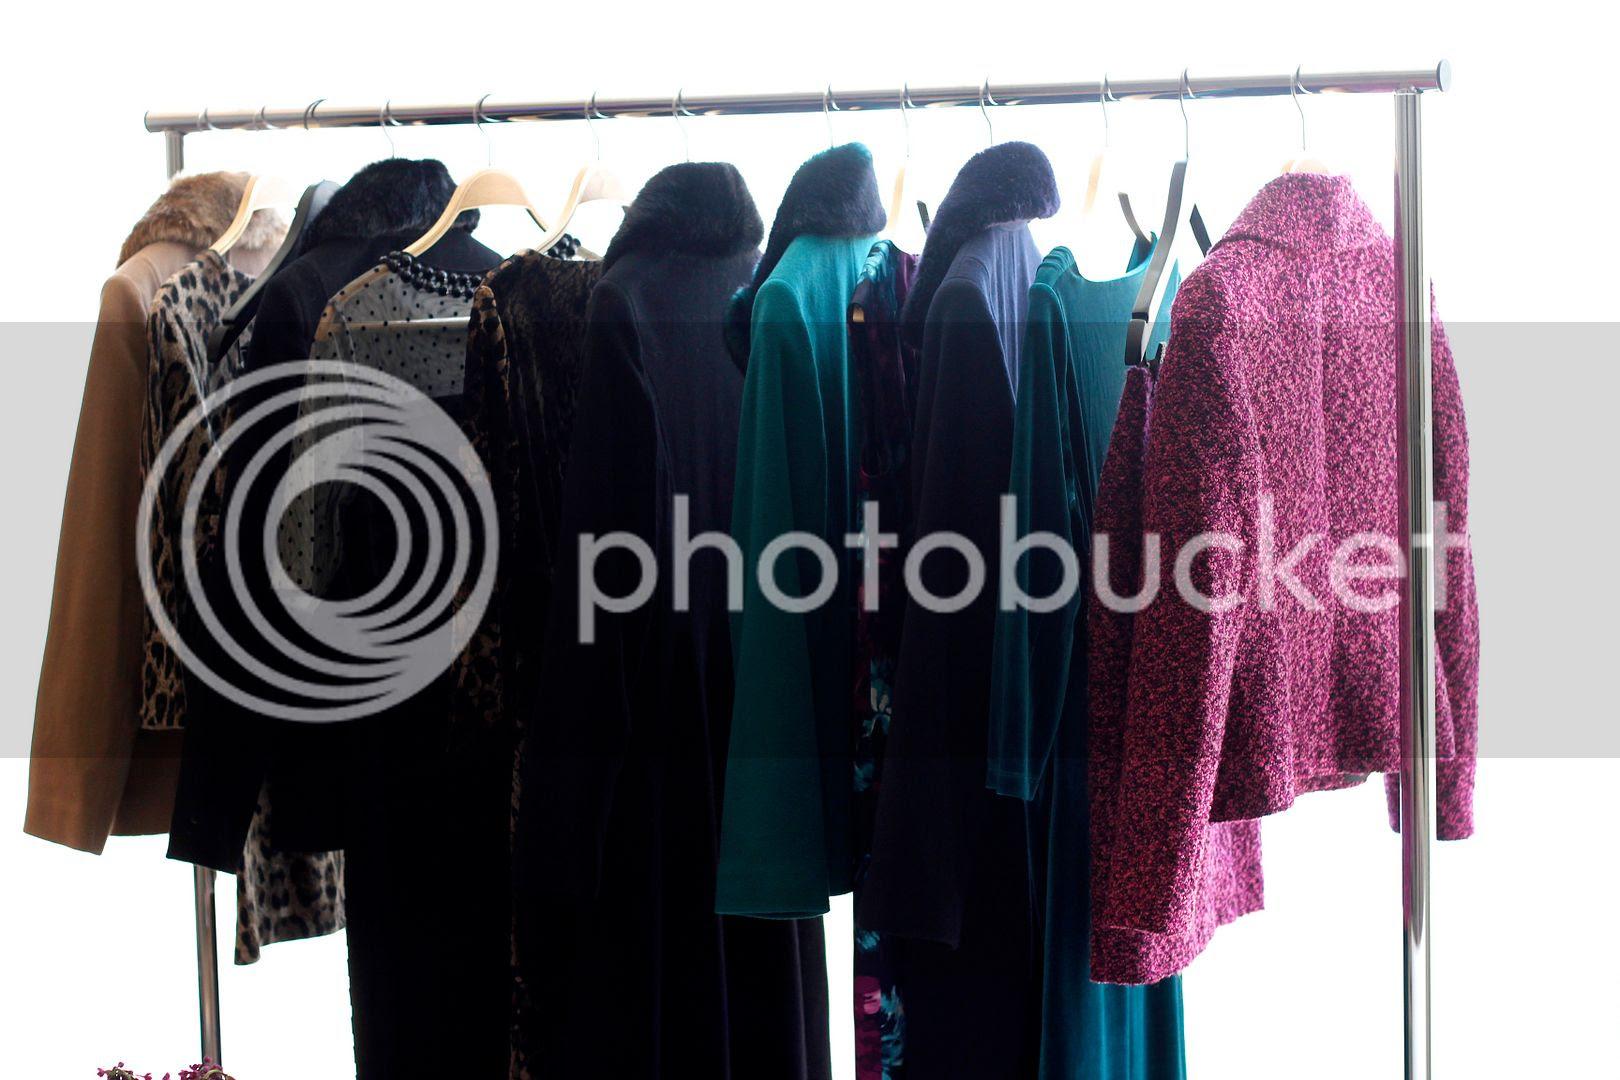 Jacques Vert AW15, Jacques Vert, Windsmoor, Colebrooke, Plus Size Fashion toronto canada plus size blogger winter coats ombre